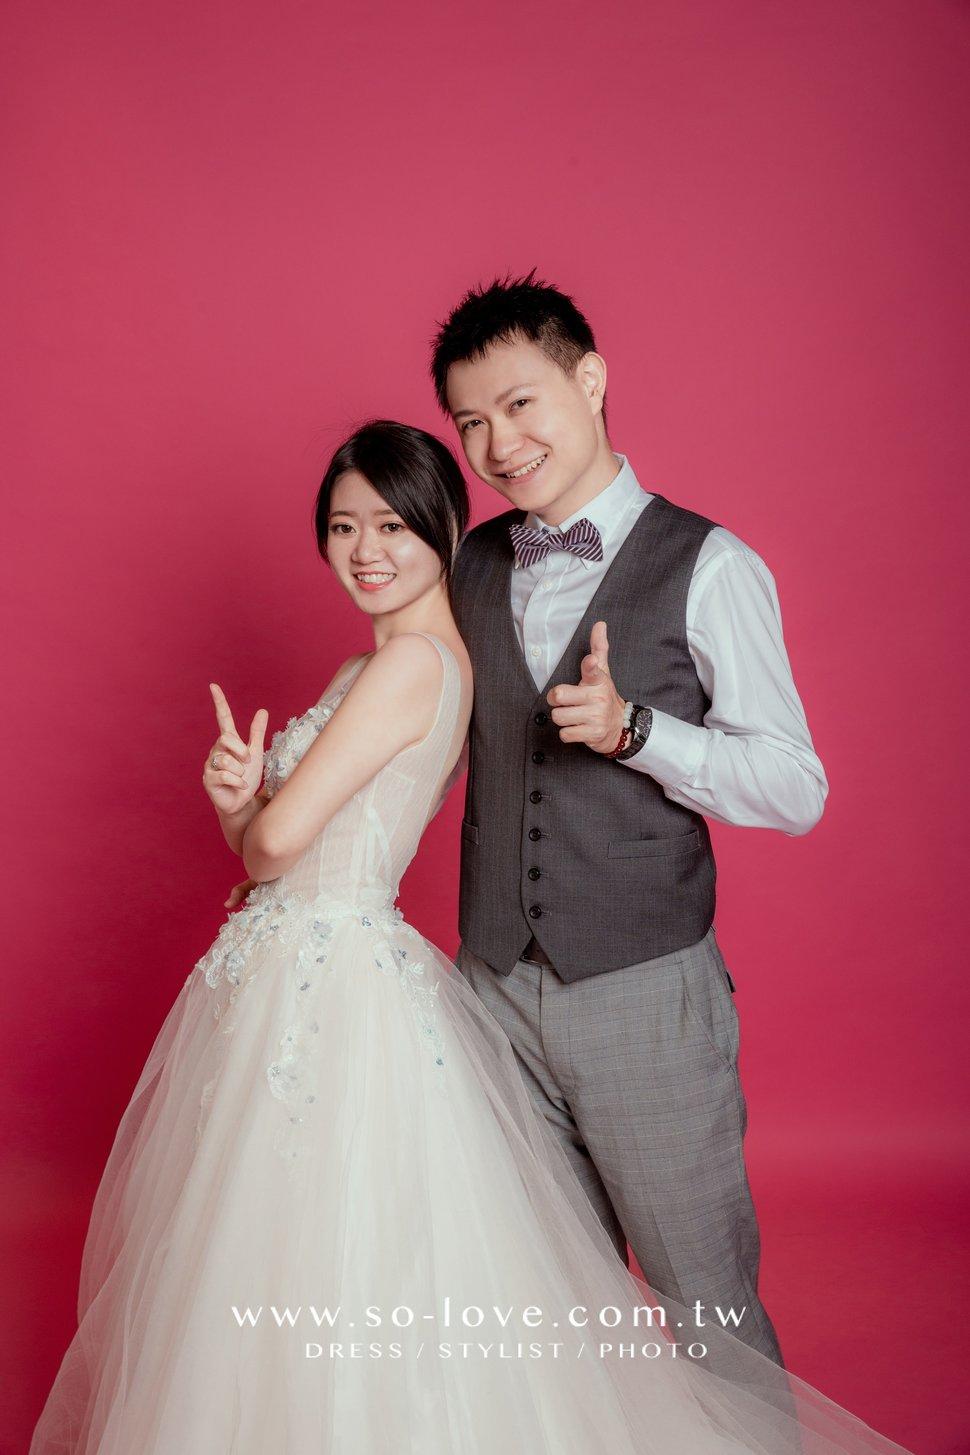 RCG2B1339 - So.Love Wedding 樂樂蕾絲《結婚吧》